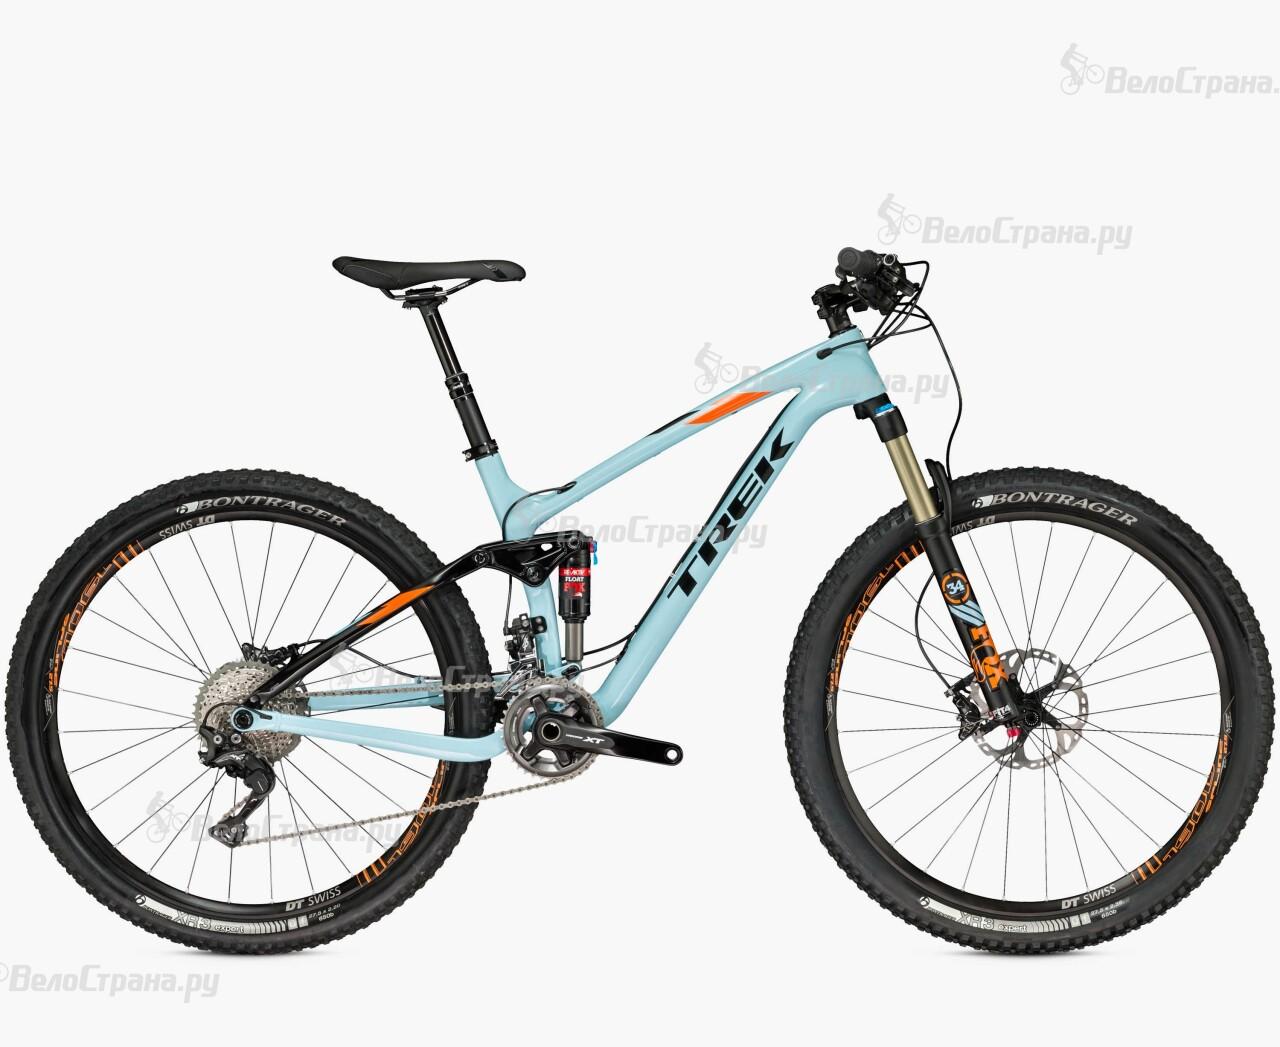 Велосипед Trek Fuel EX 9.8 27.5 (2016) велосипед trek fuel ex 9 29 2017